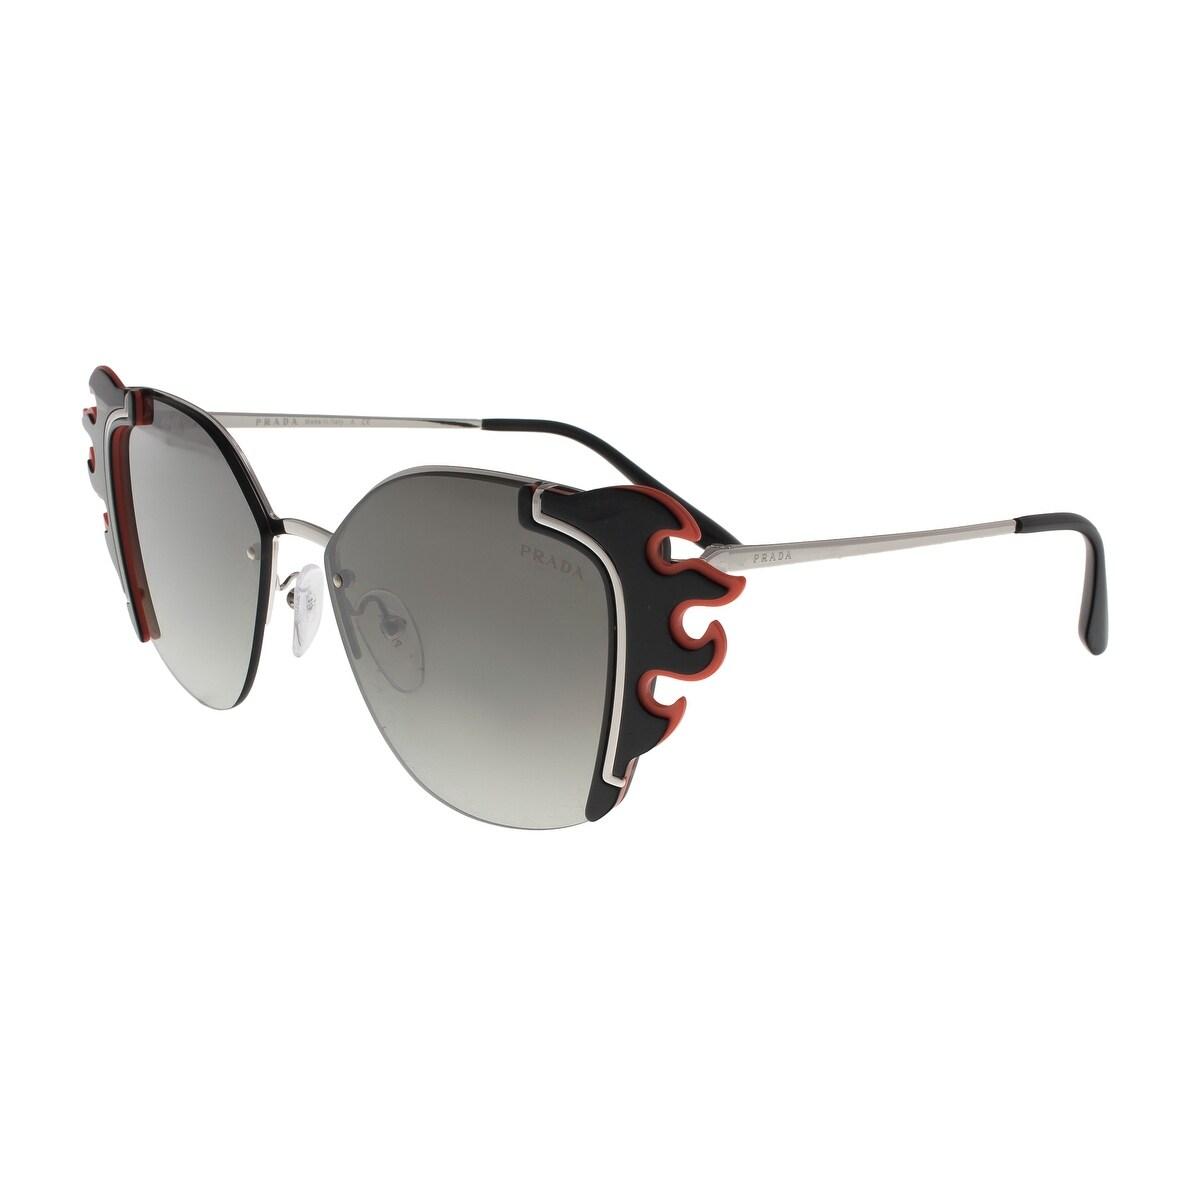 998d2f137ba Cateye Prada Women s Sunglasses